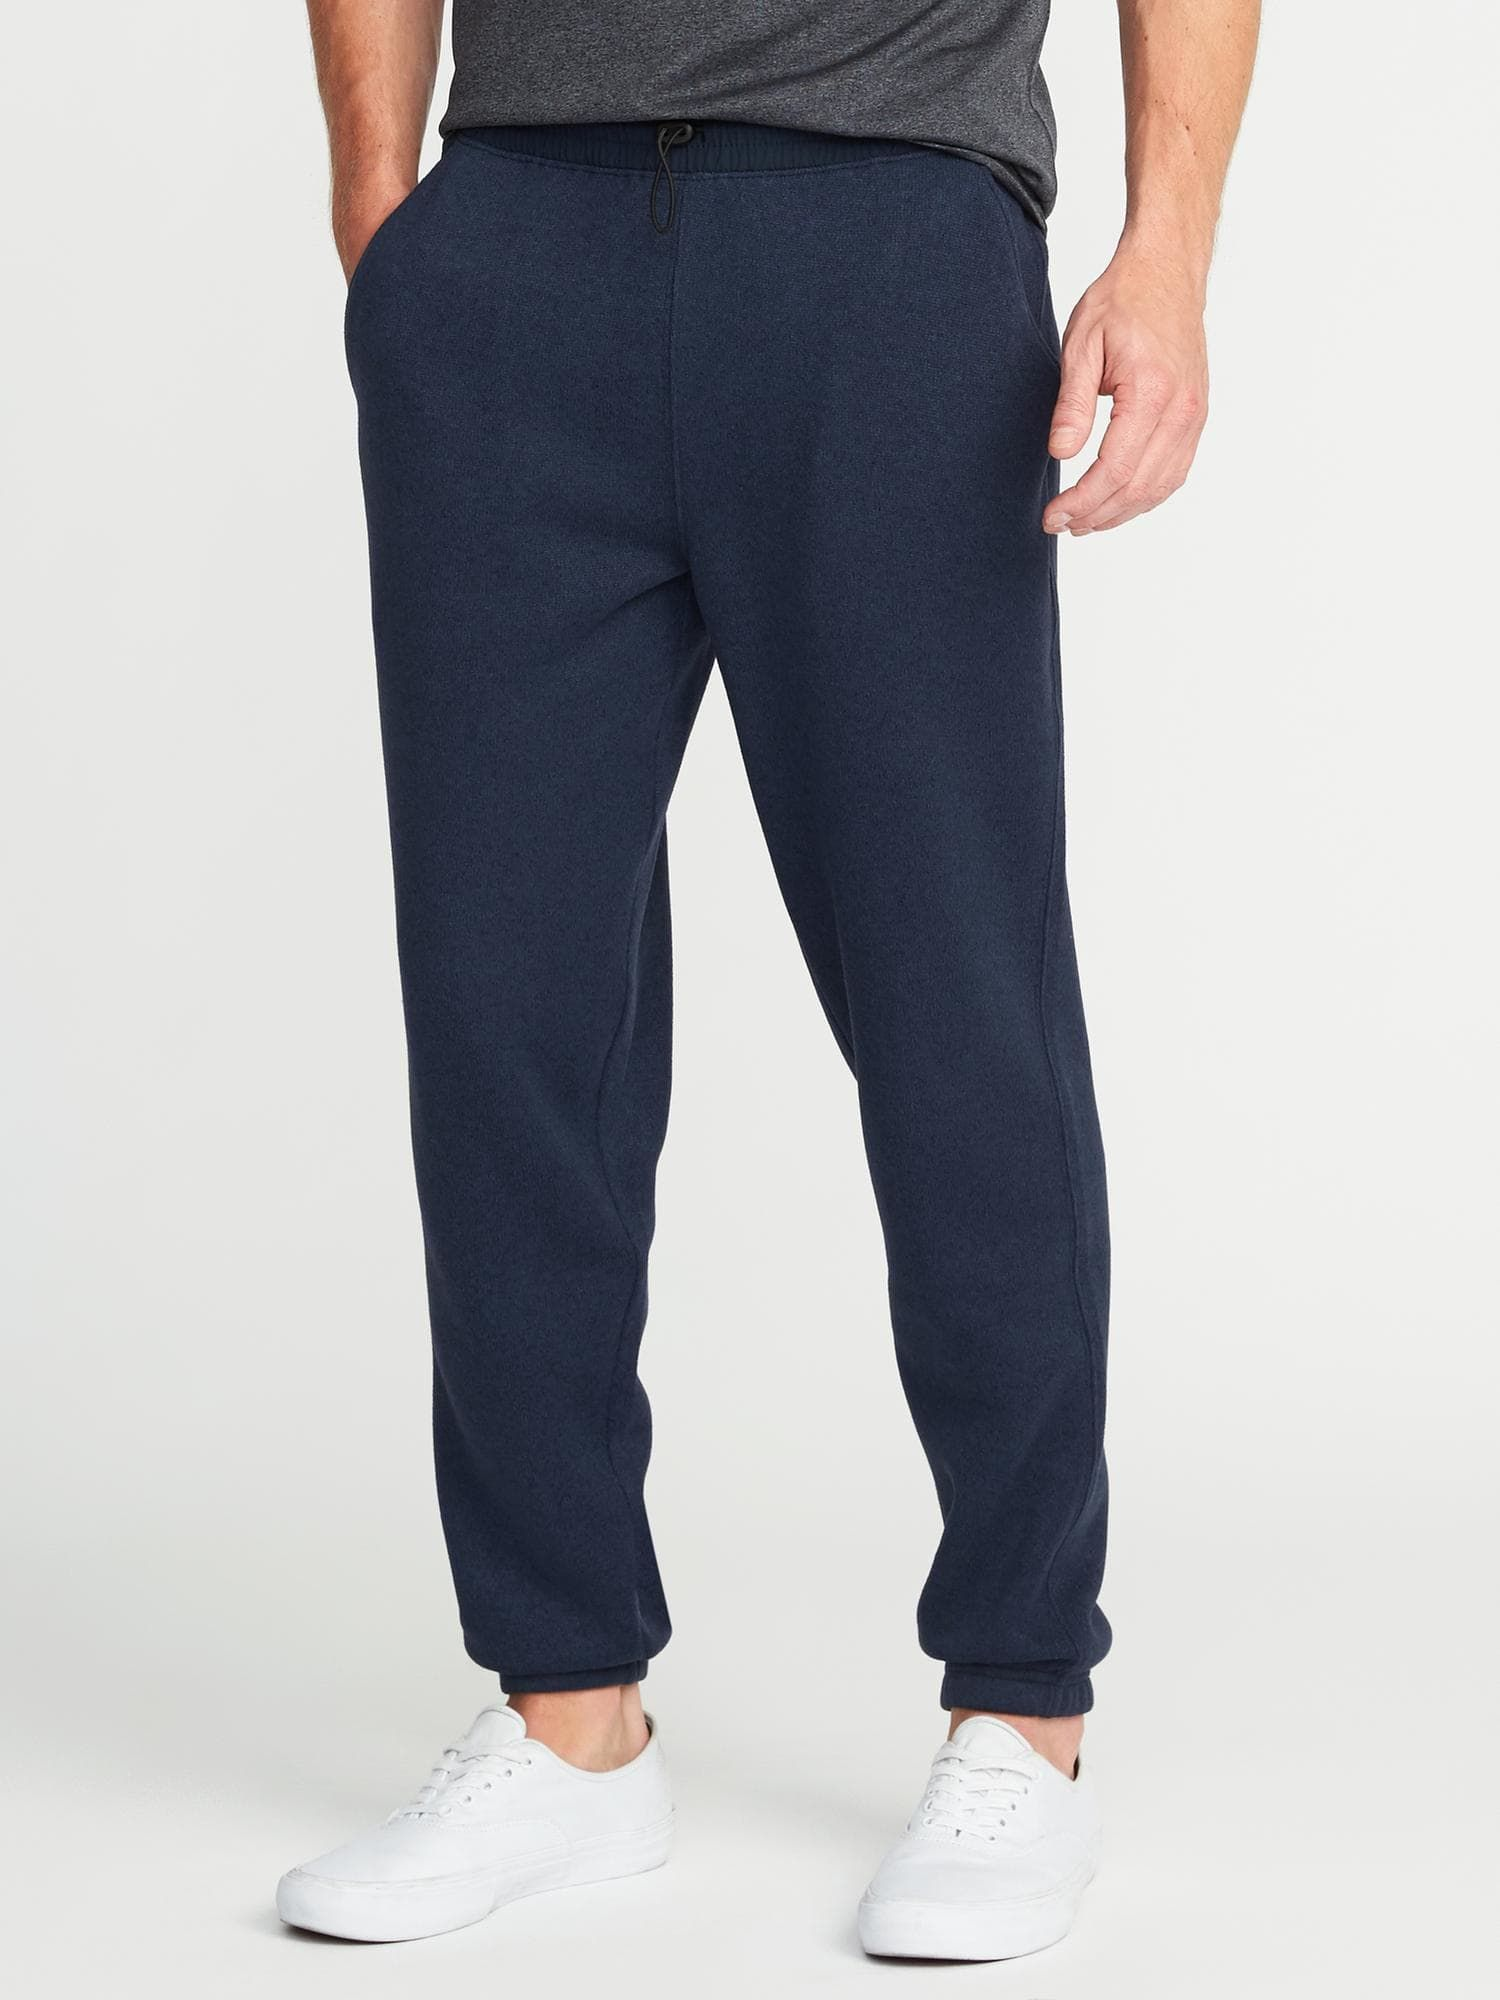 881bd5a0448bcf Cargo Pant With 360 Flextech Waistband | Josh and Len | Cargo pants, Pants,  Work pants